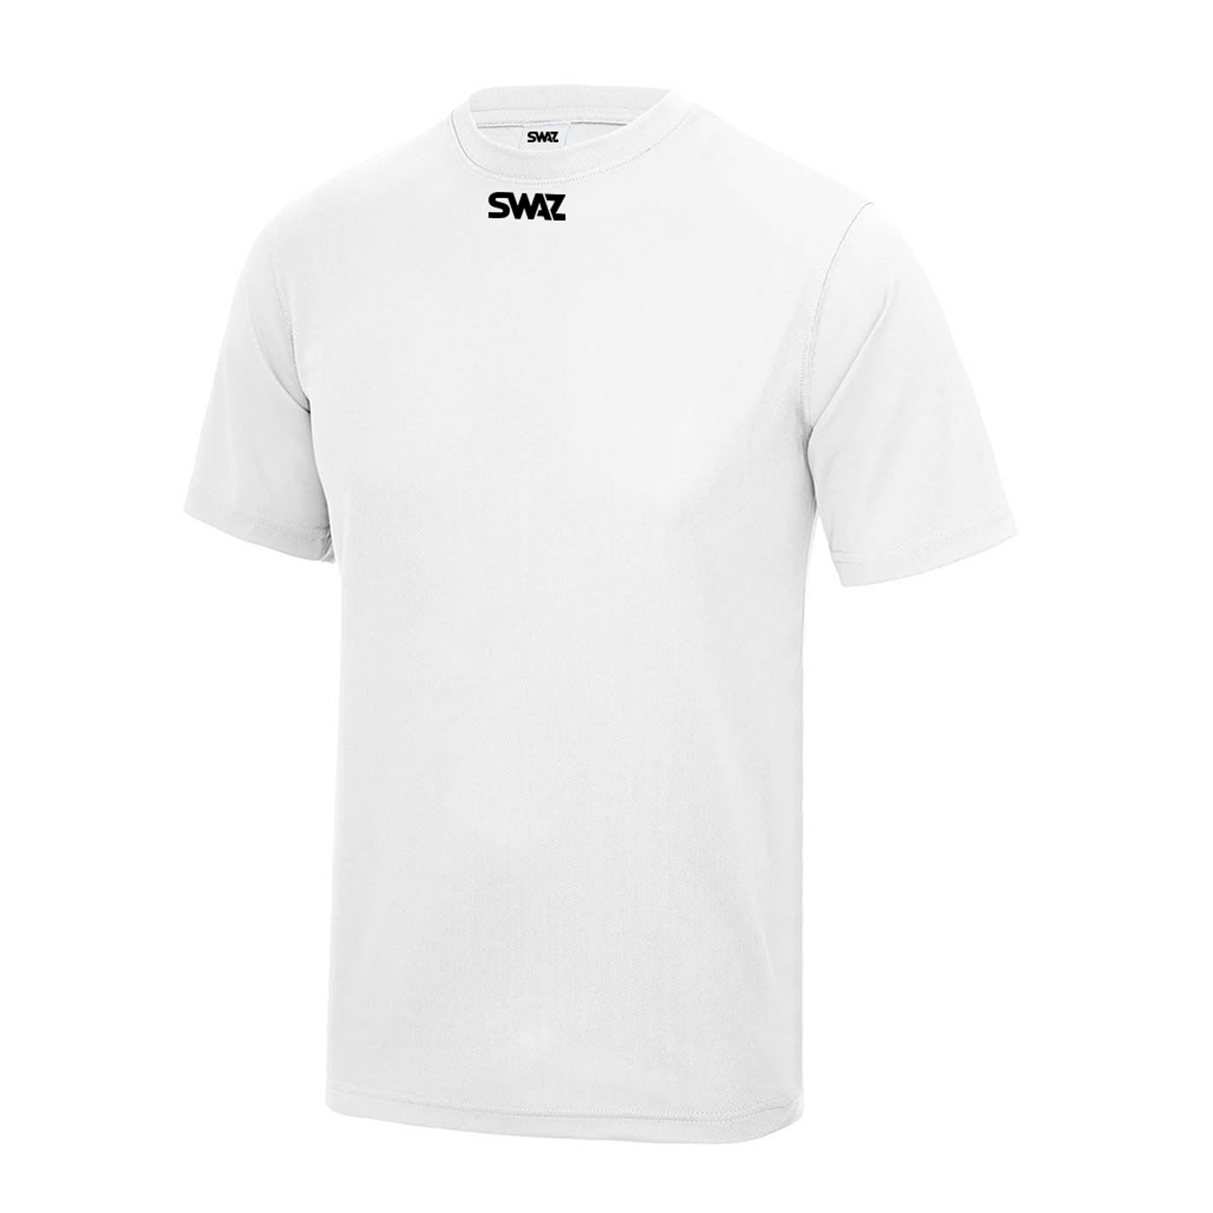 SWAZ Club Training T-Shirt – White